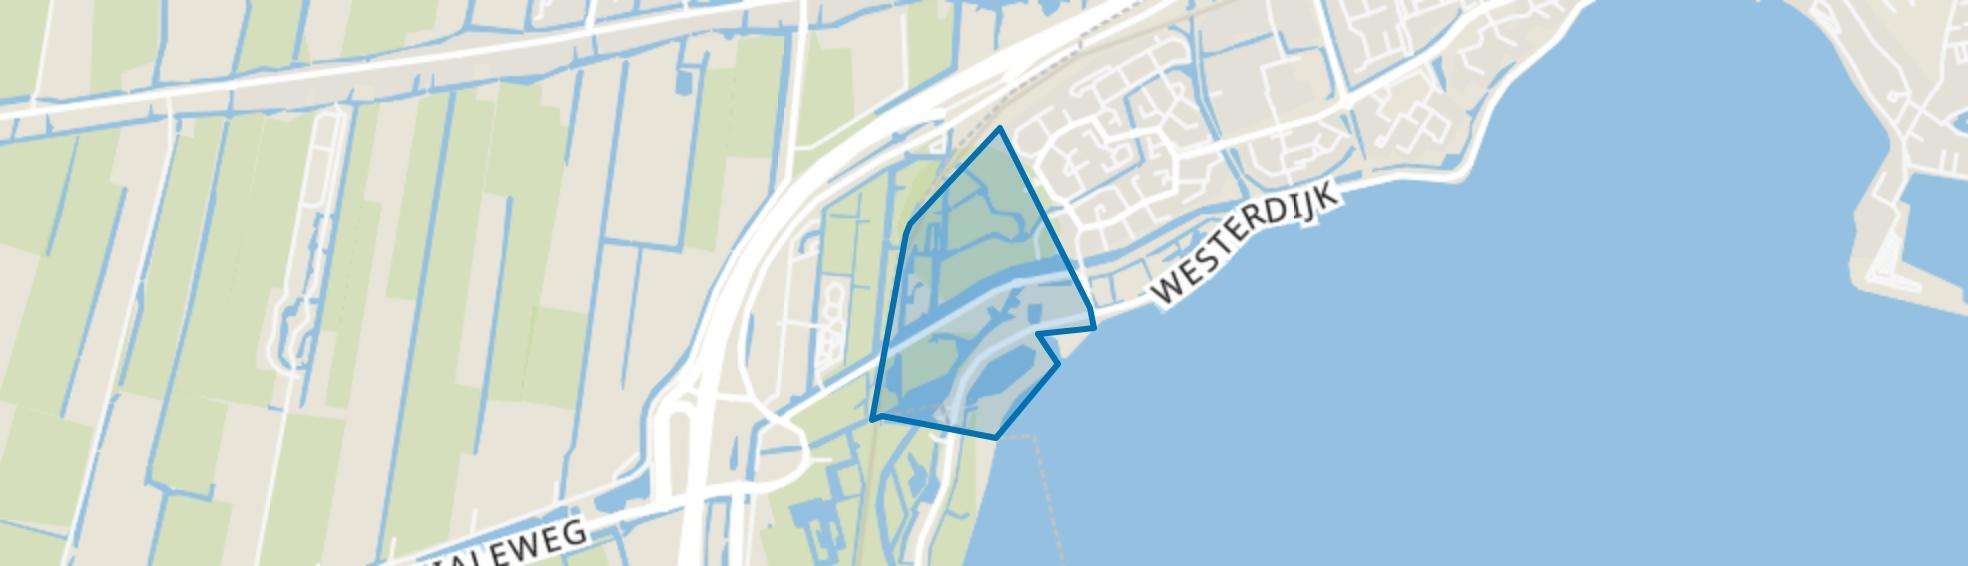 Grote Waal - Buurt 13 08, Hoorn (NH) map